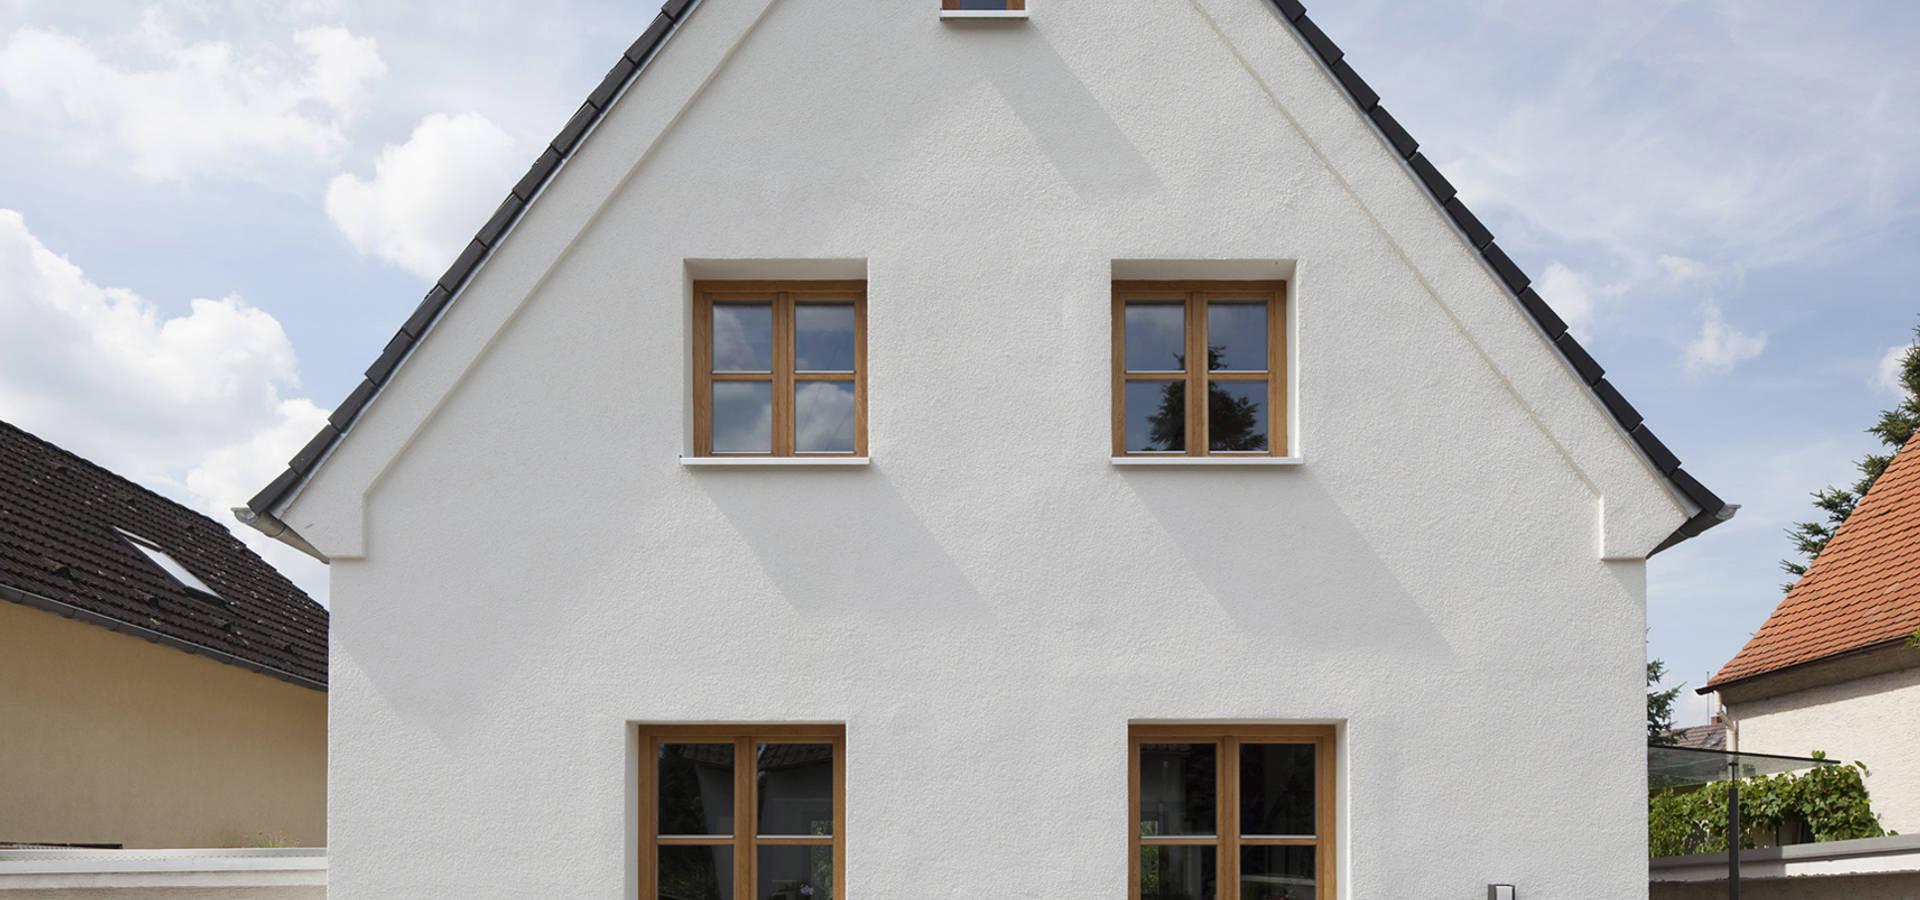 gerstner kaluza architektur gmbh architekten in frankfurt. Black Bedroom Furniture Sets. Home Design Ideas